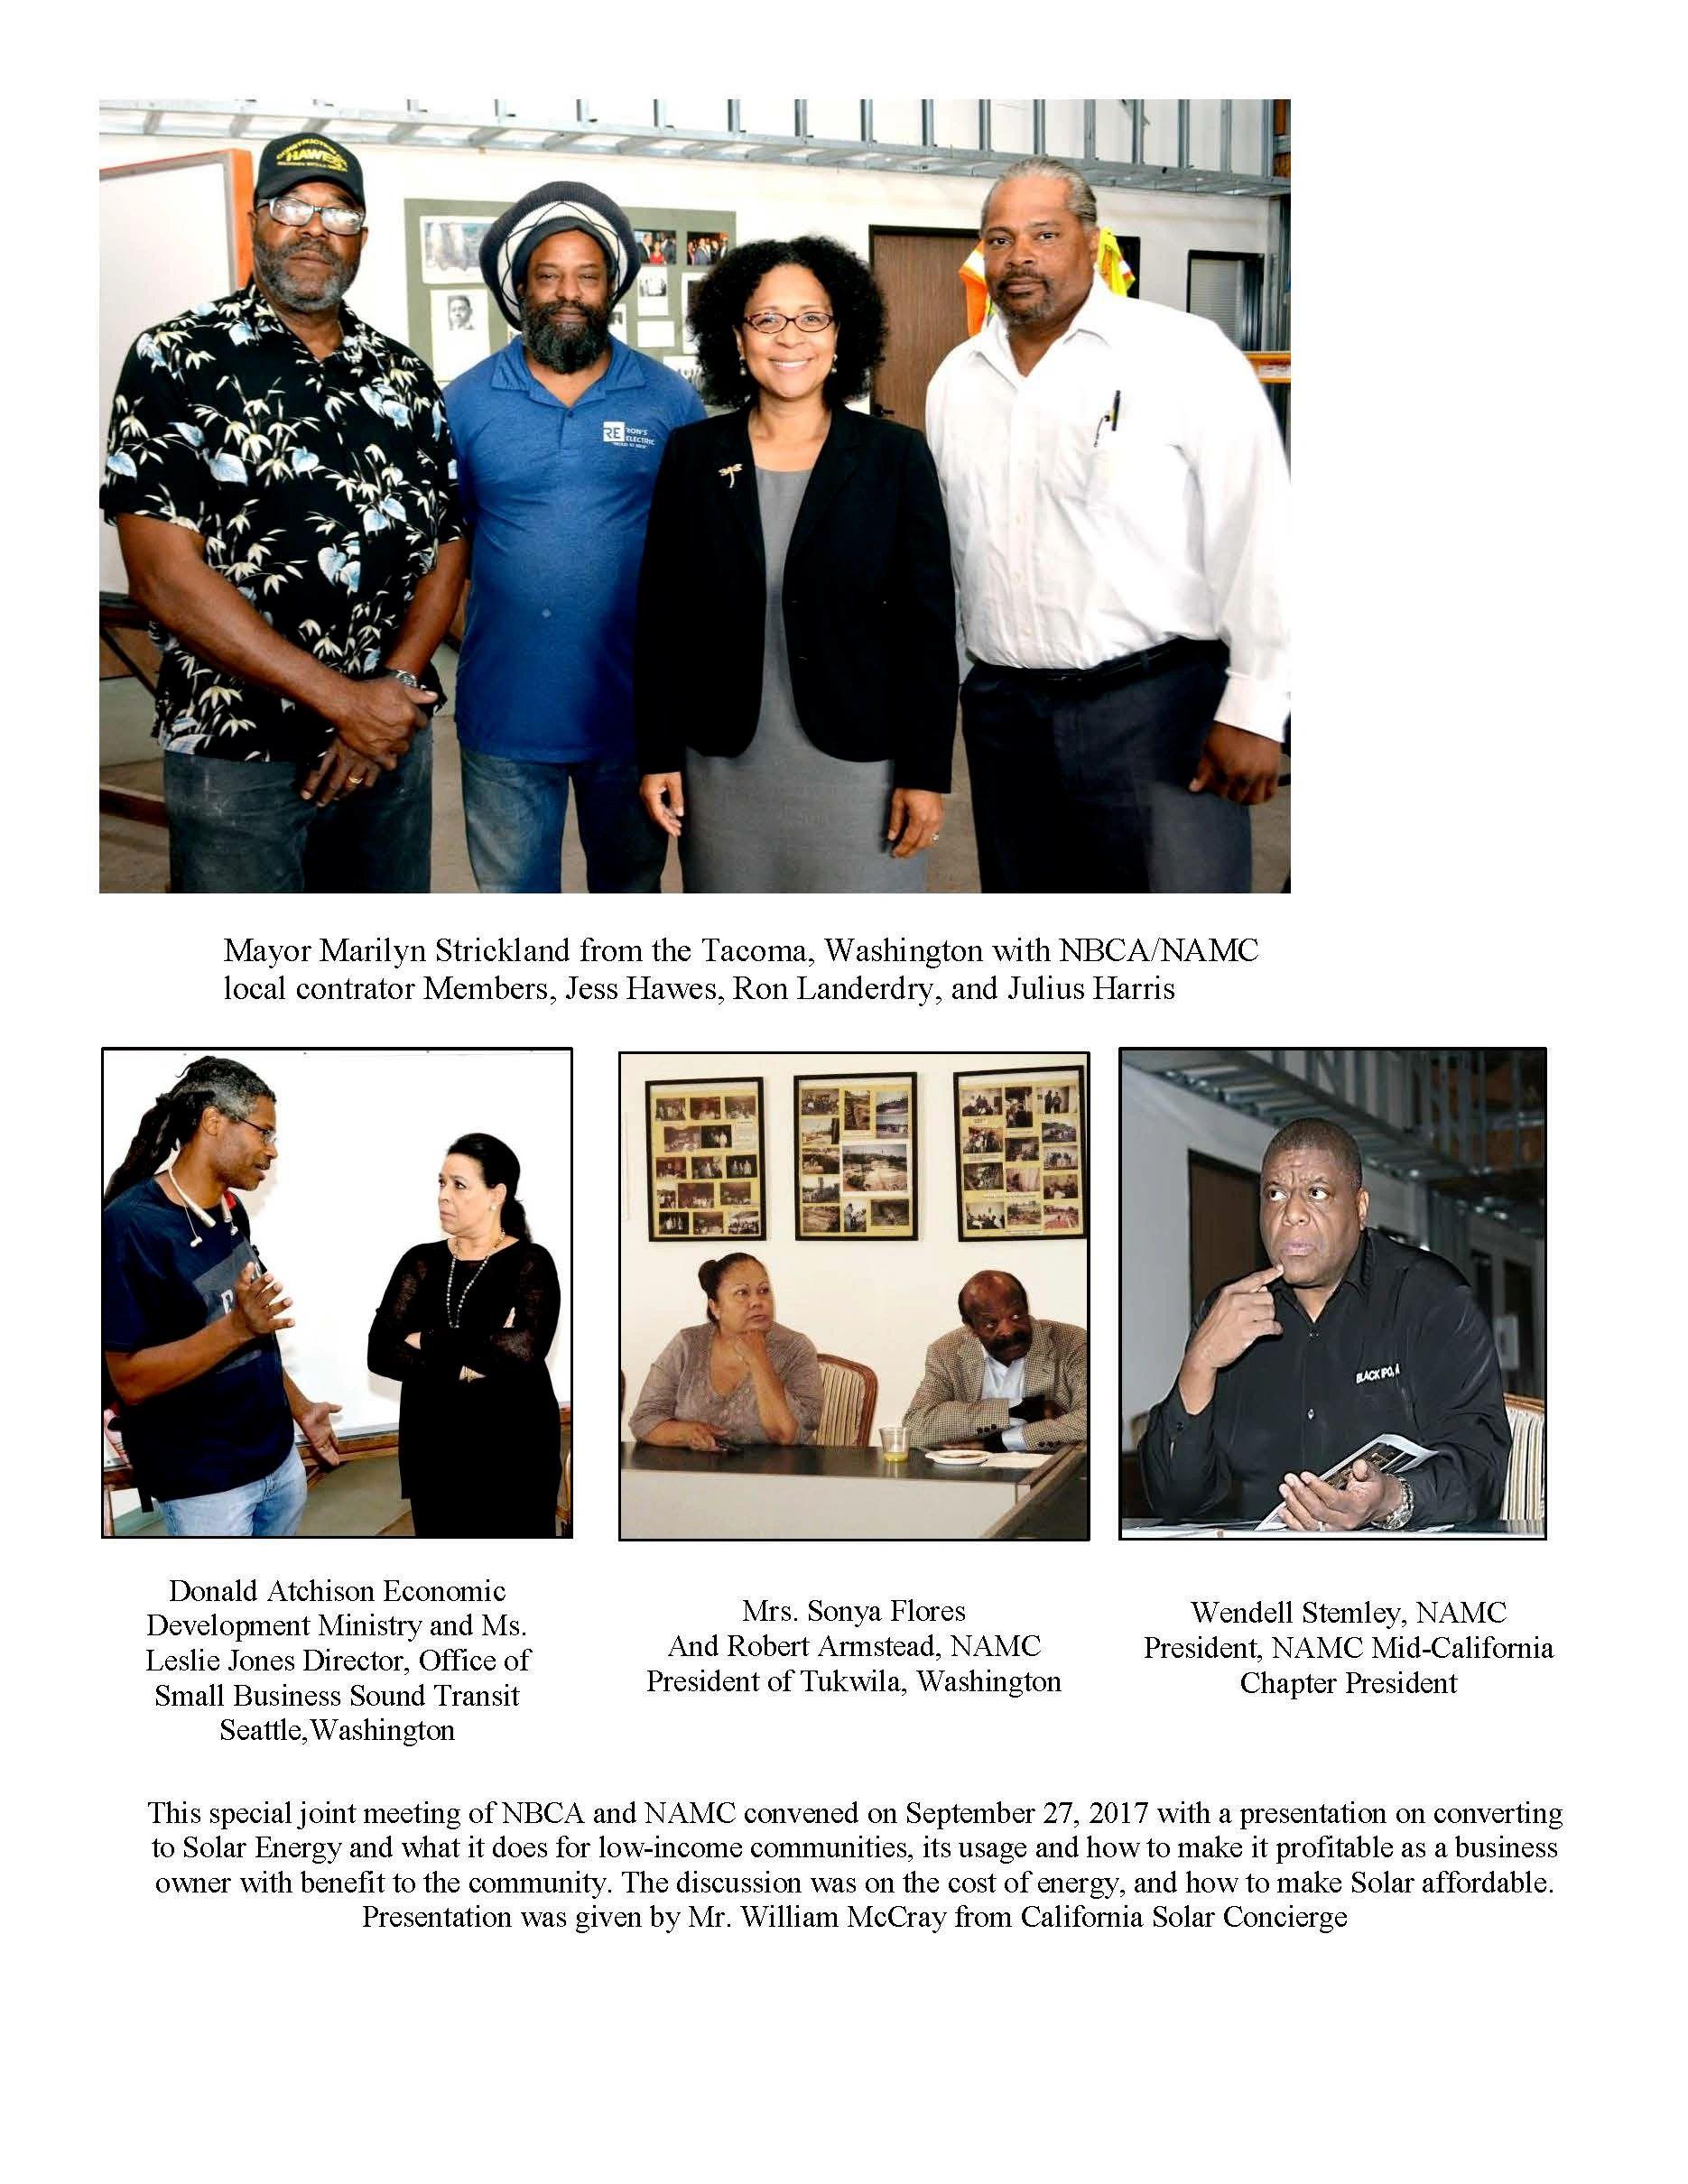 Bids | National Association of Minority Contractors Middle